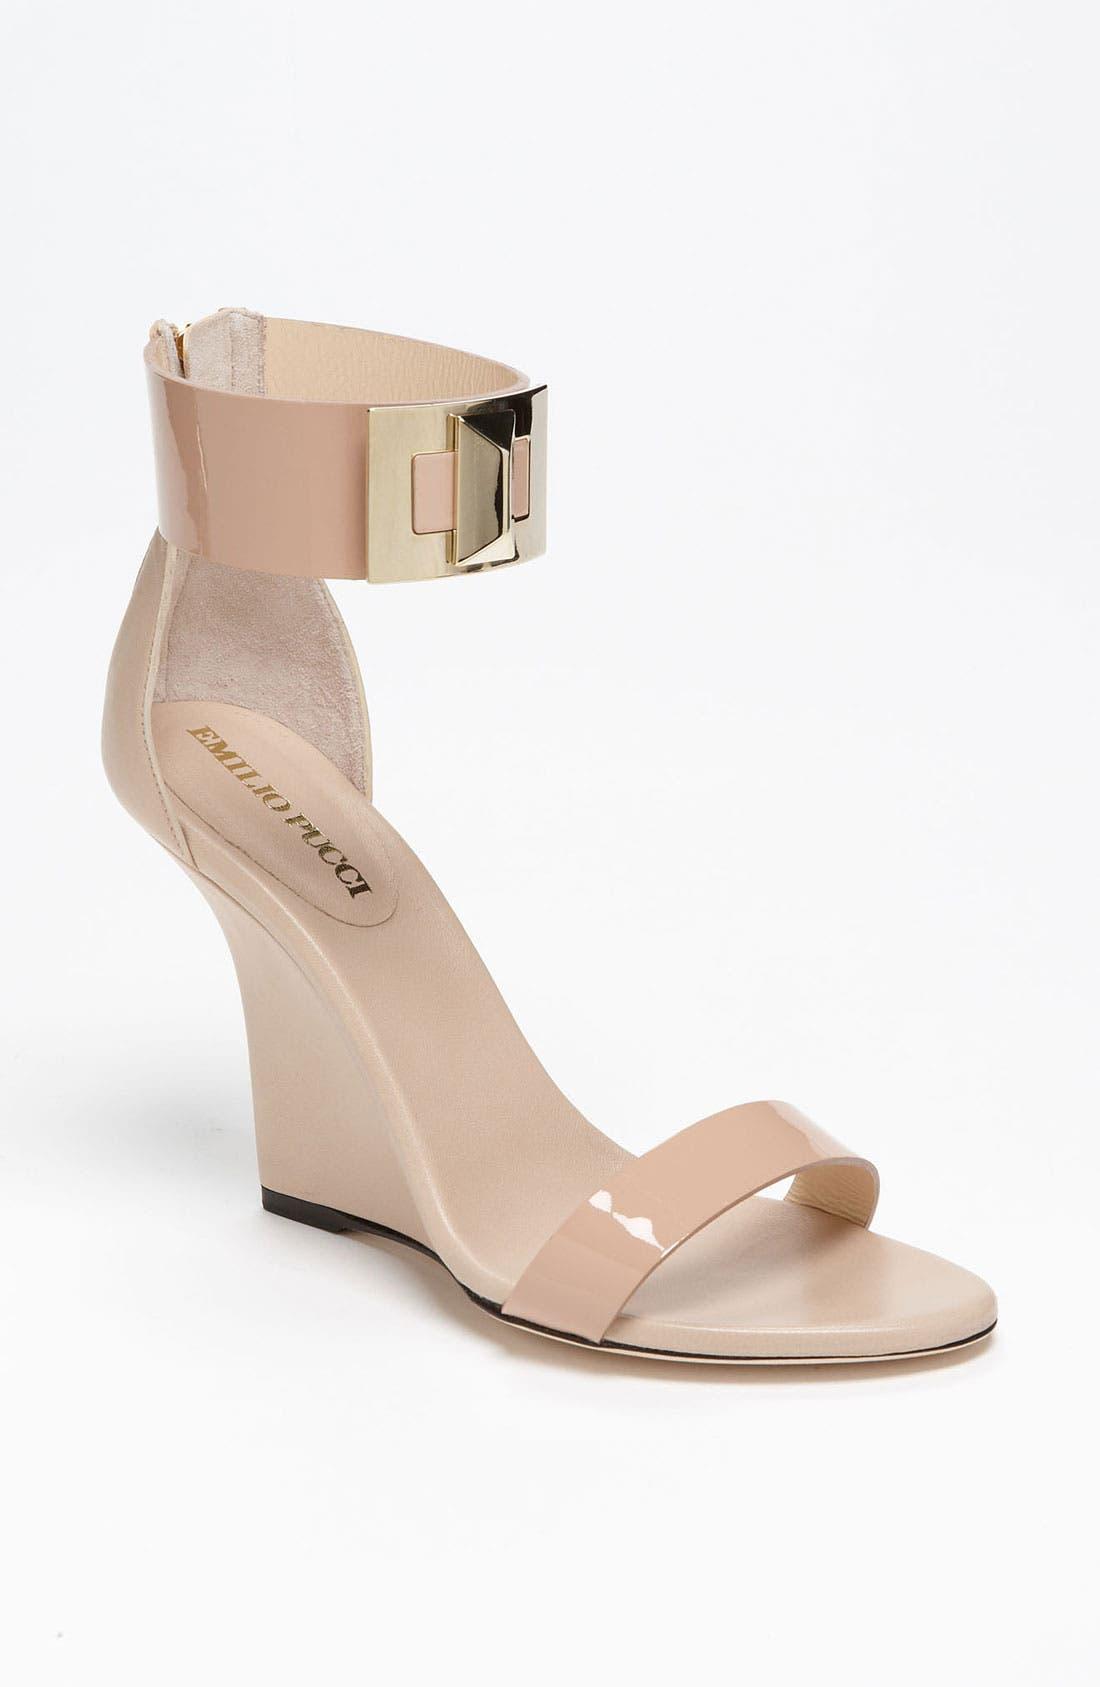 Main Image - Emilio Pucci 'Marquise' Wedge Sandal